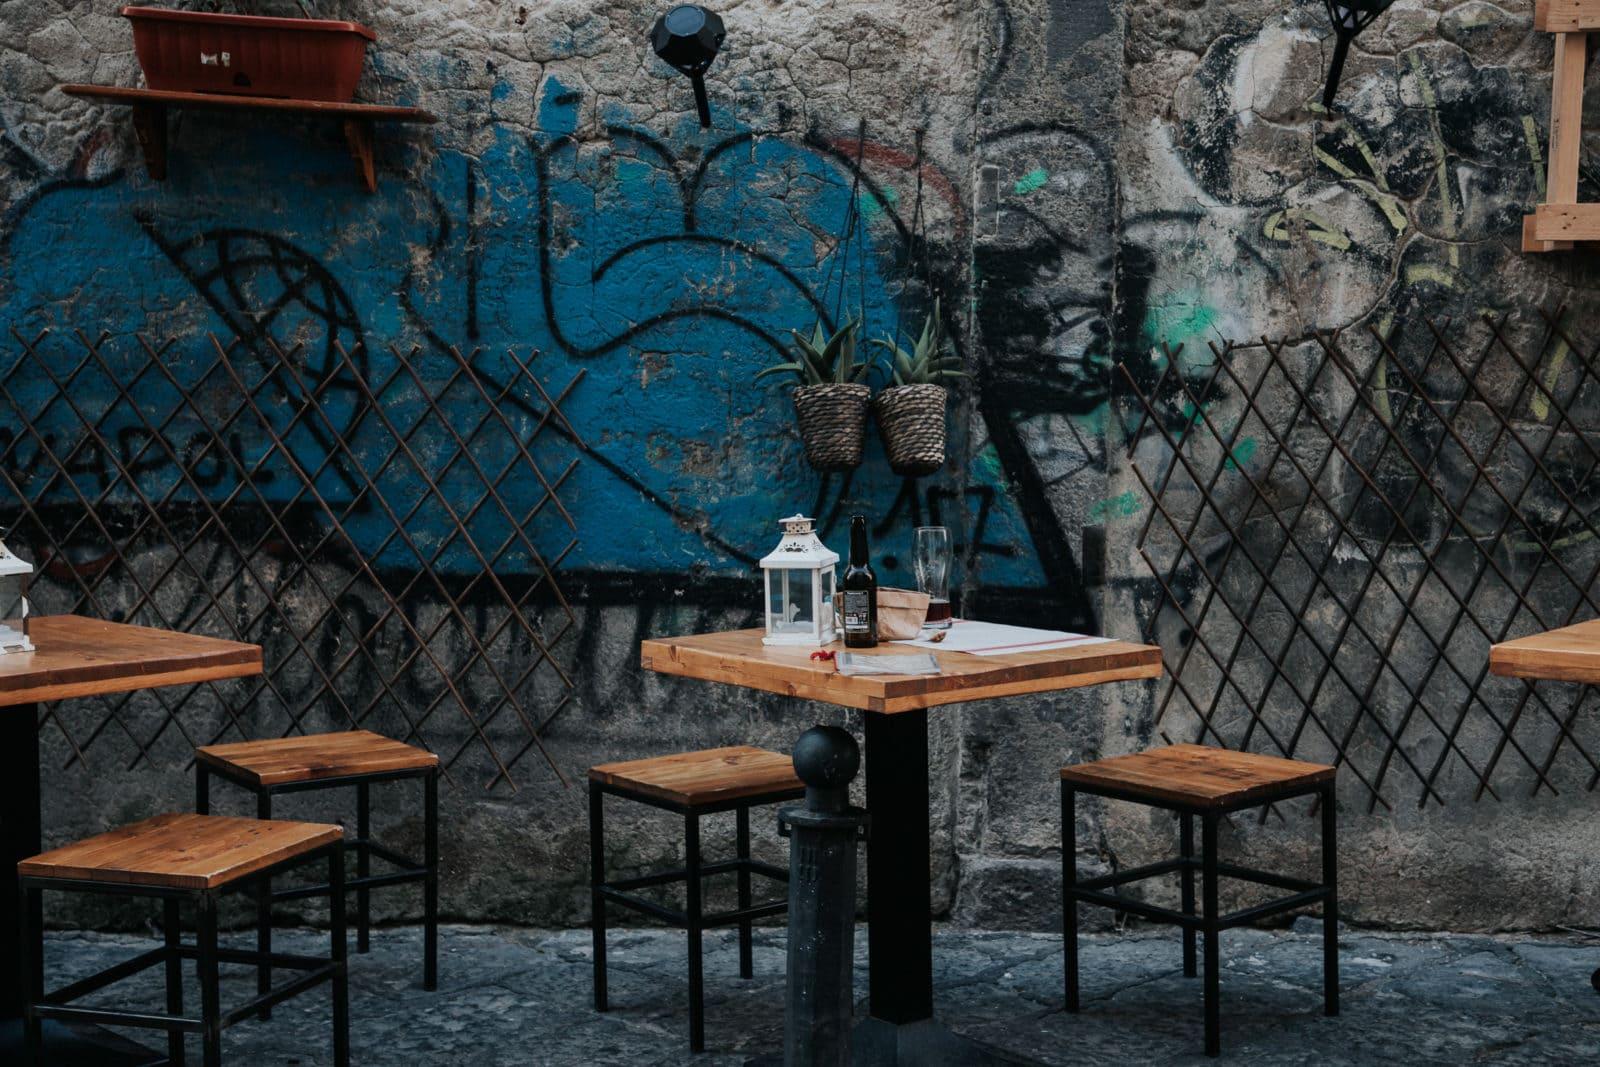 Neapel Sehenswürdigkeiten Altstadt Strassencafe